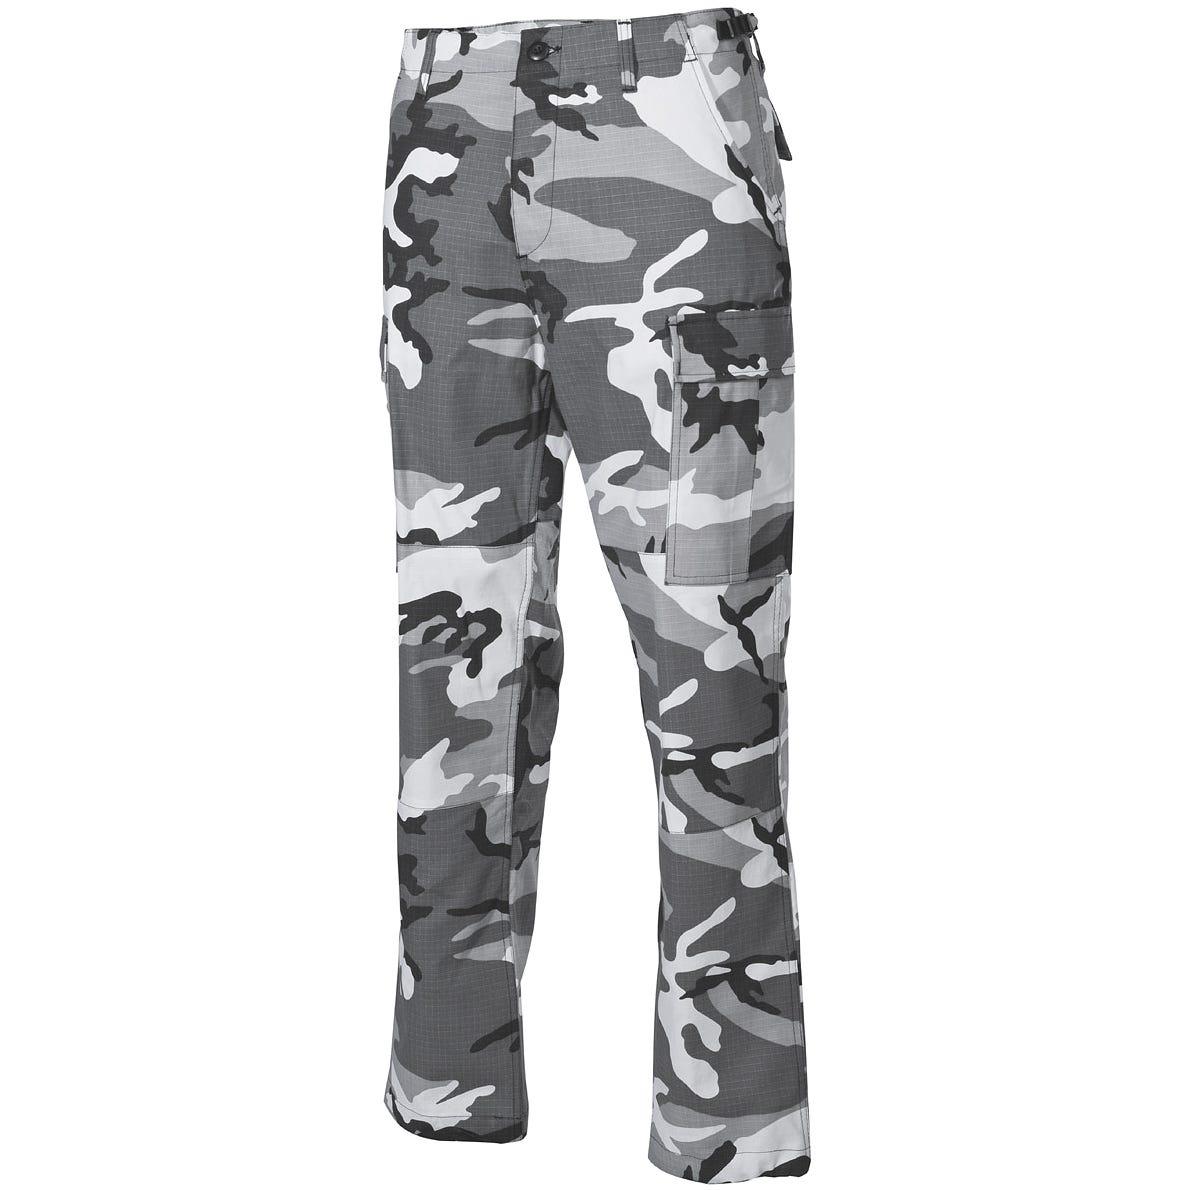 mfh bdu  MFH BDU Combat Trousers Ripstop Urban